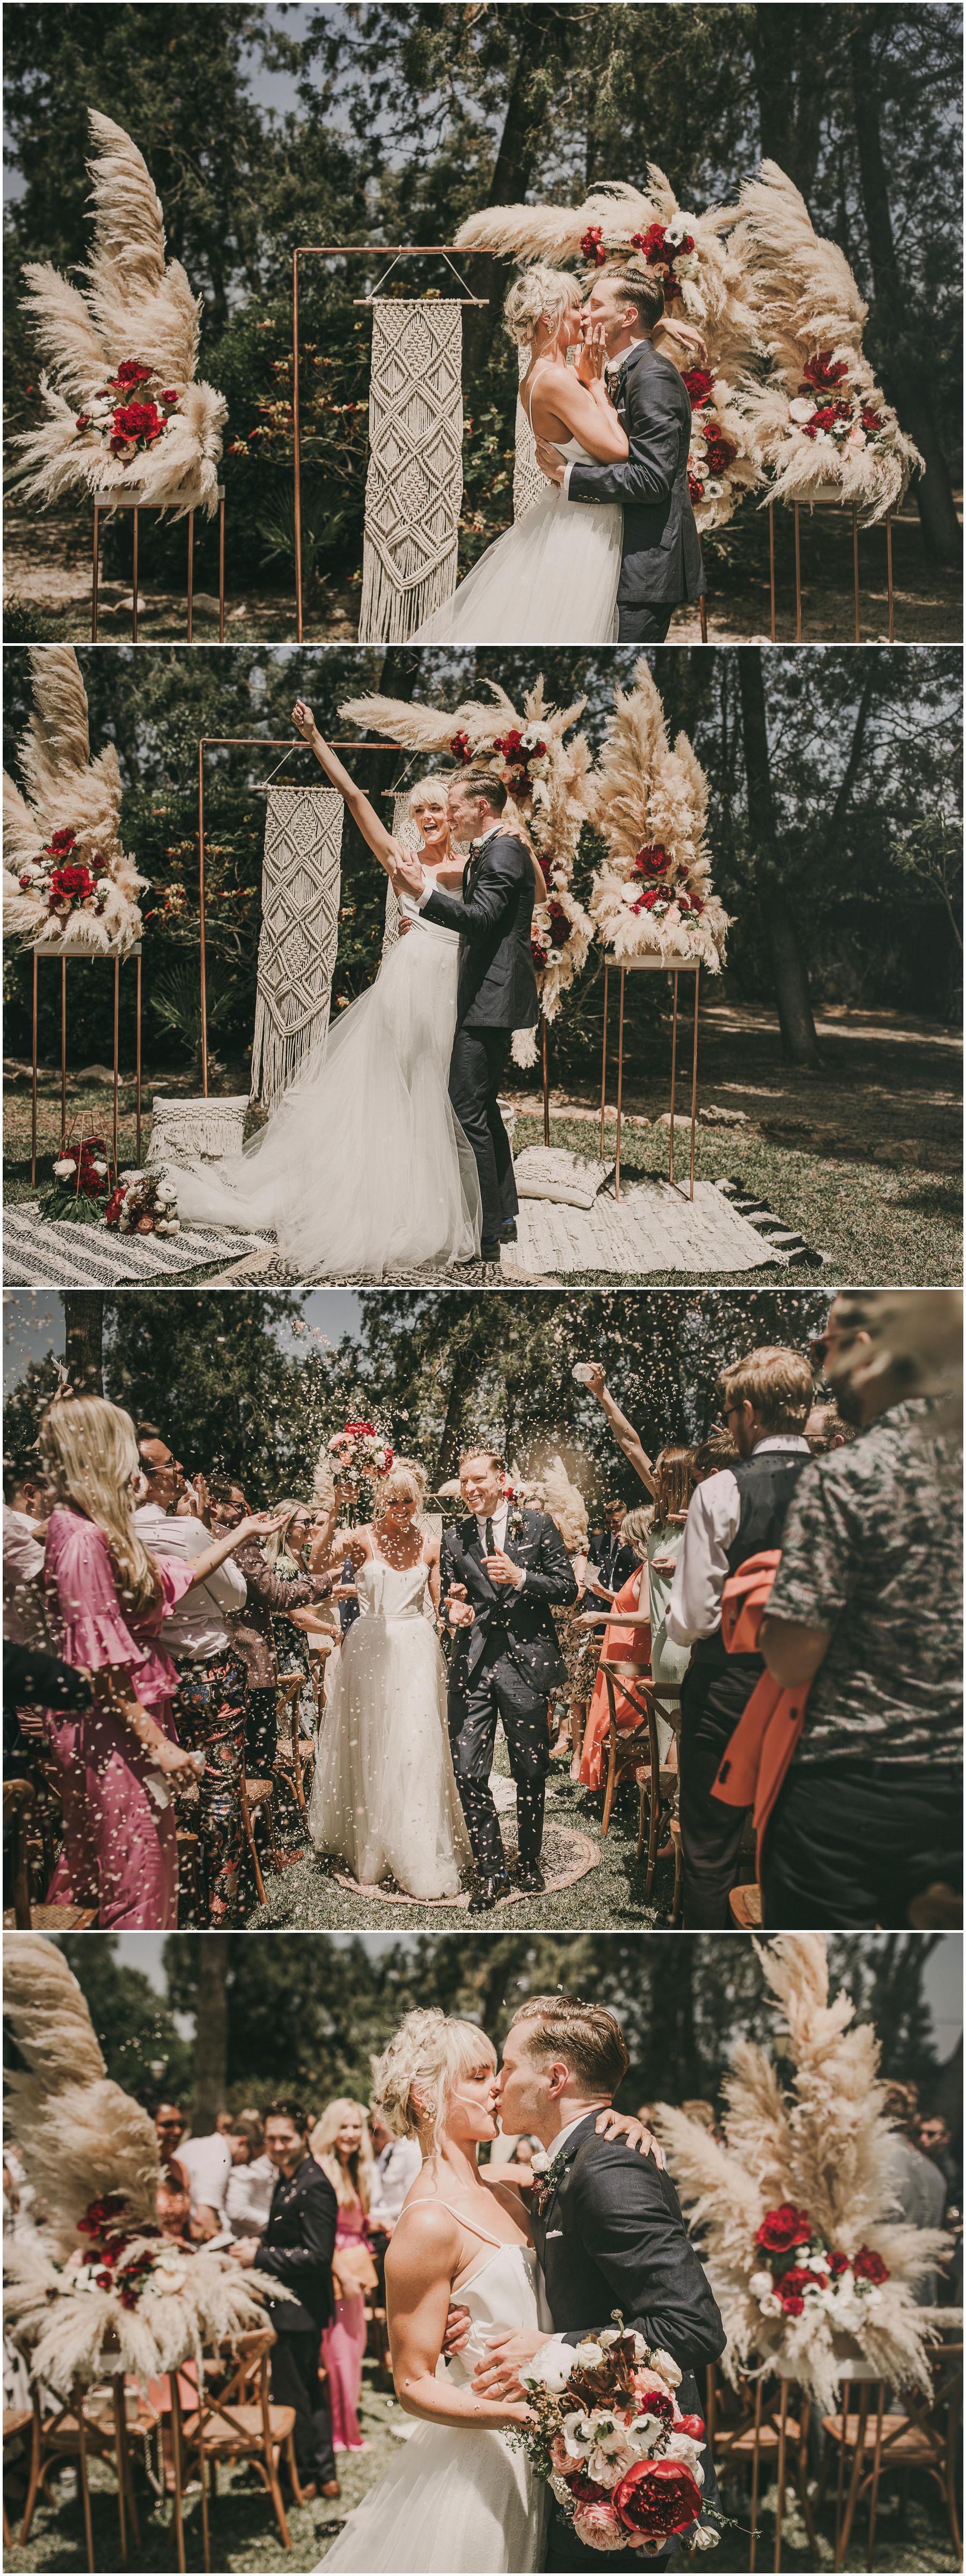 Emily & Joseph London wedding  by Pablo Laguia 097.JPG